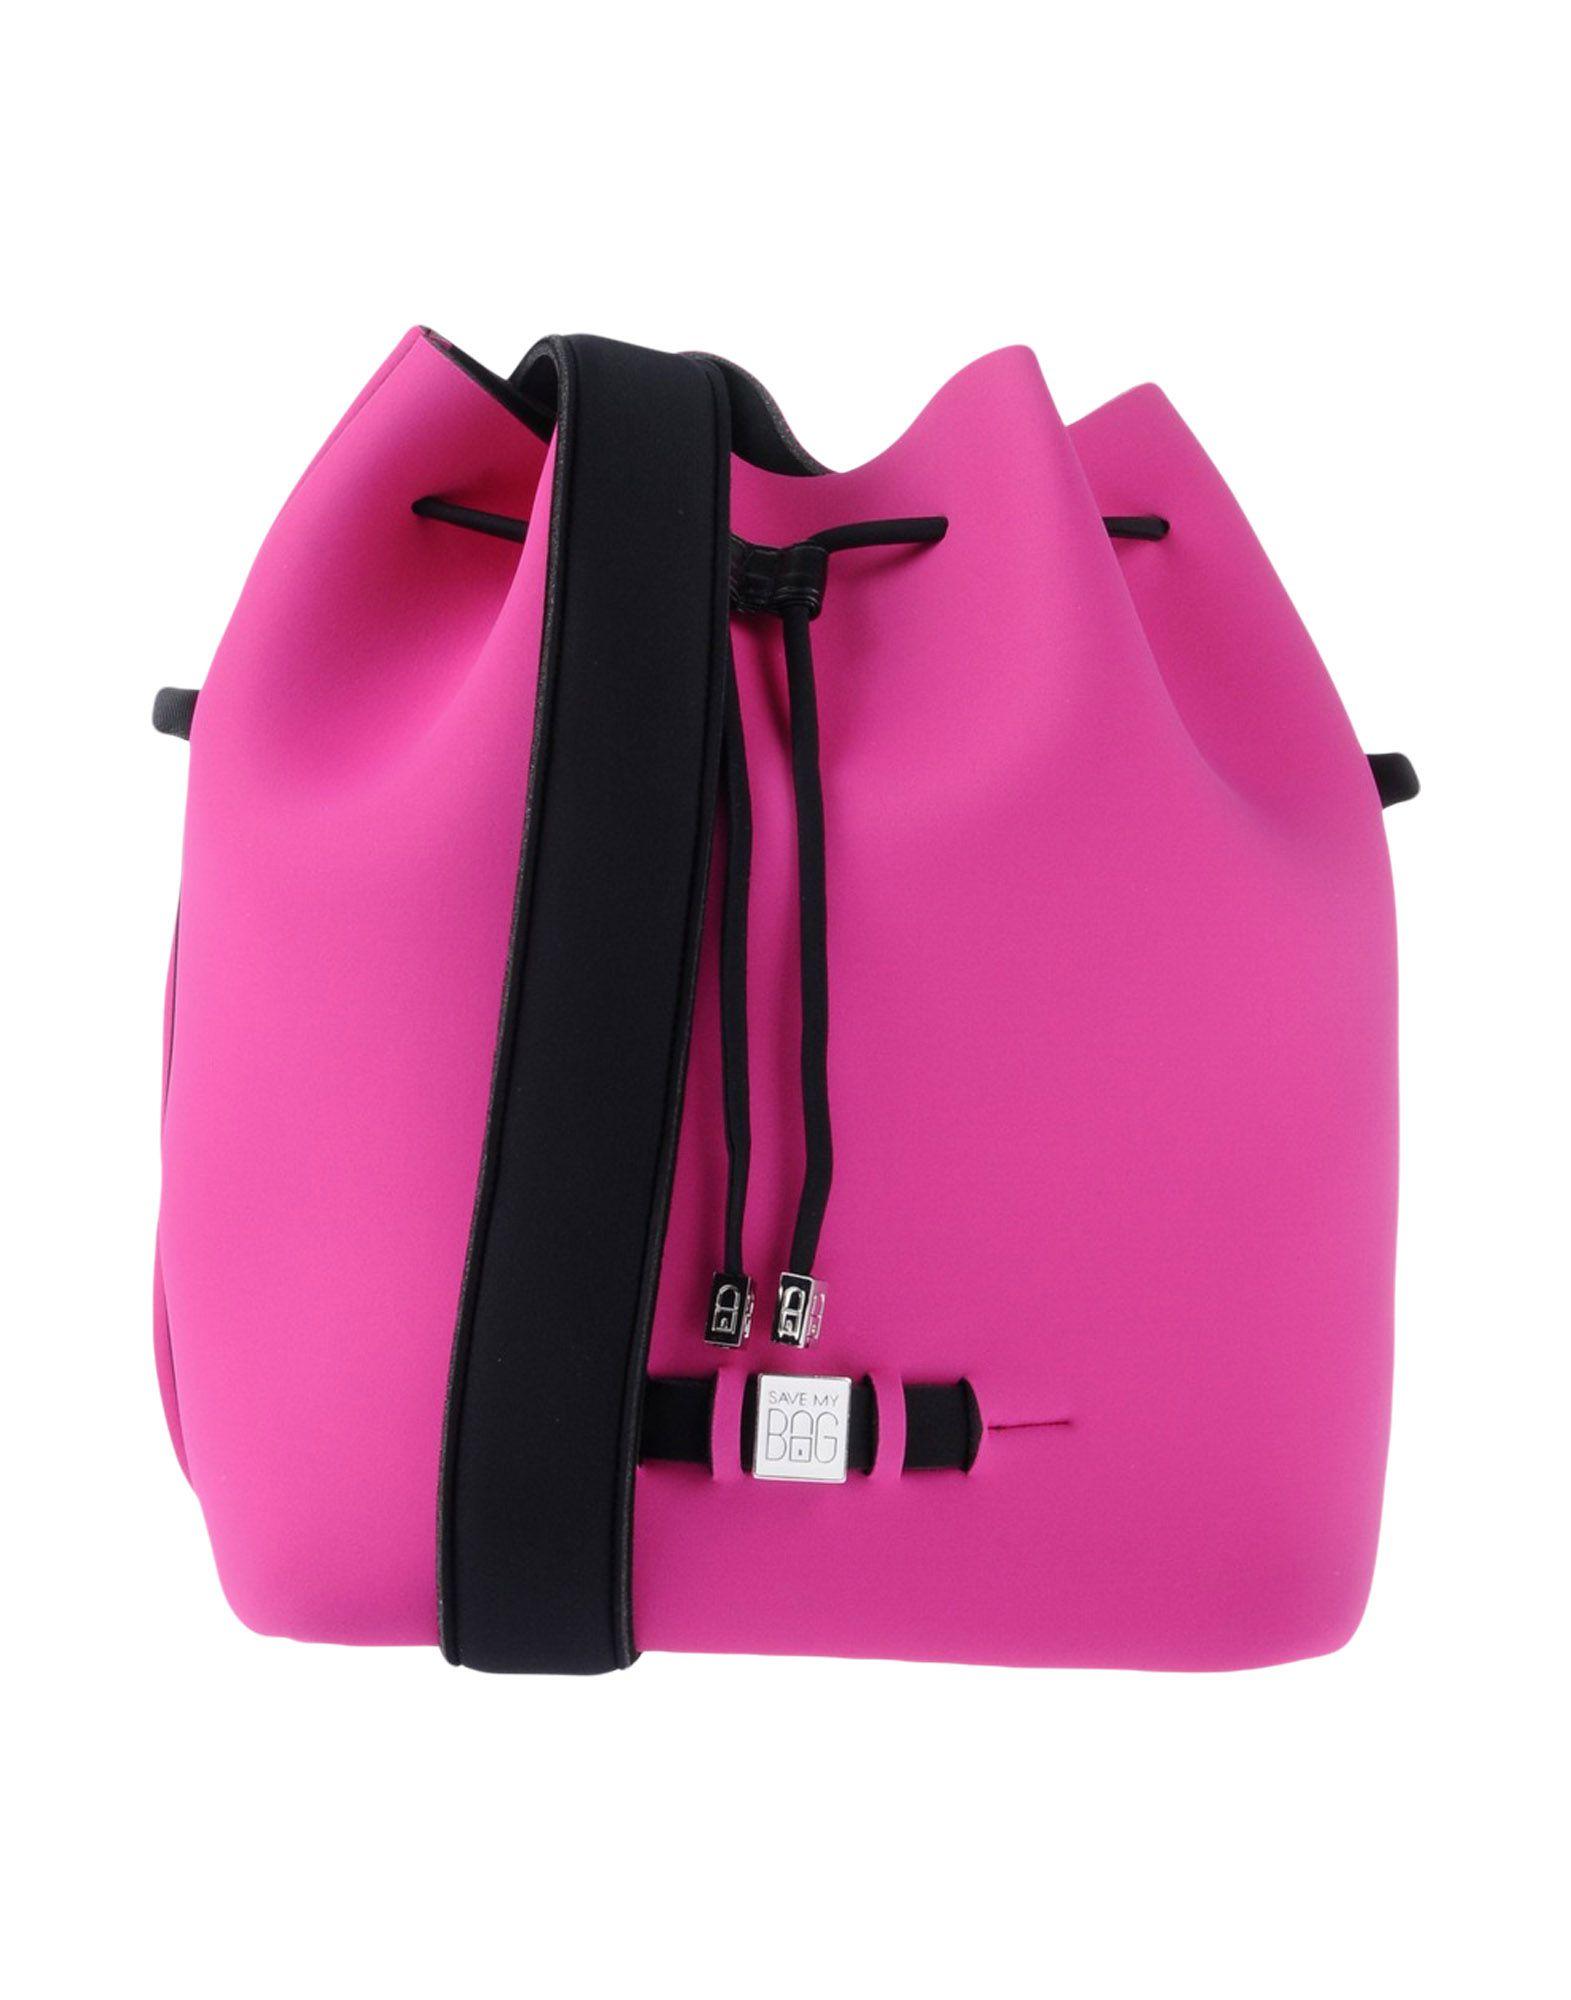 Фото - SAVE MY BAG Сумка на руку sy16 black professional waterproof outdoor bag backpack dslr slr camera bag case for nikon canon sony pentax fuji